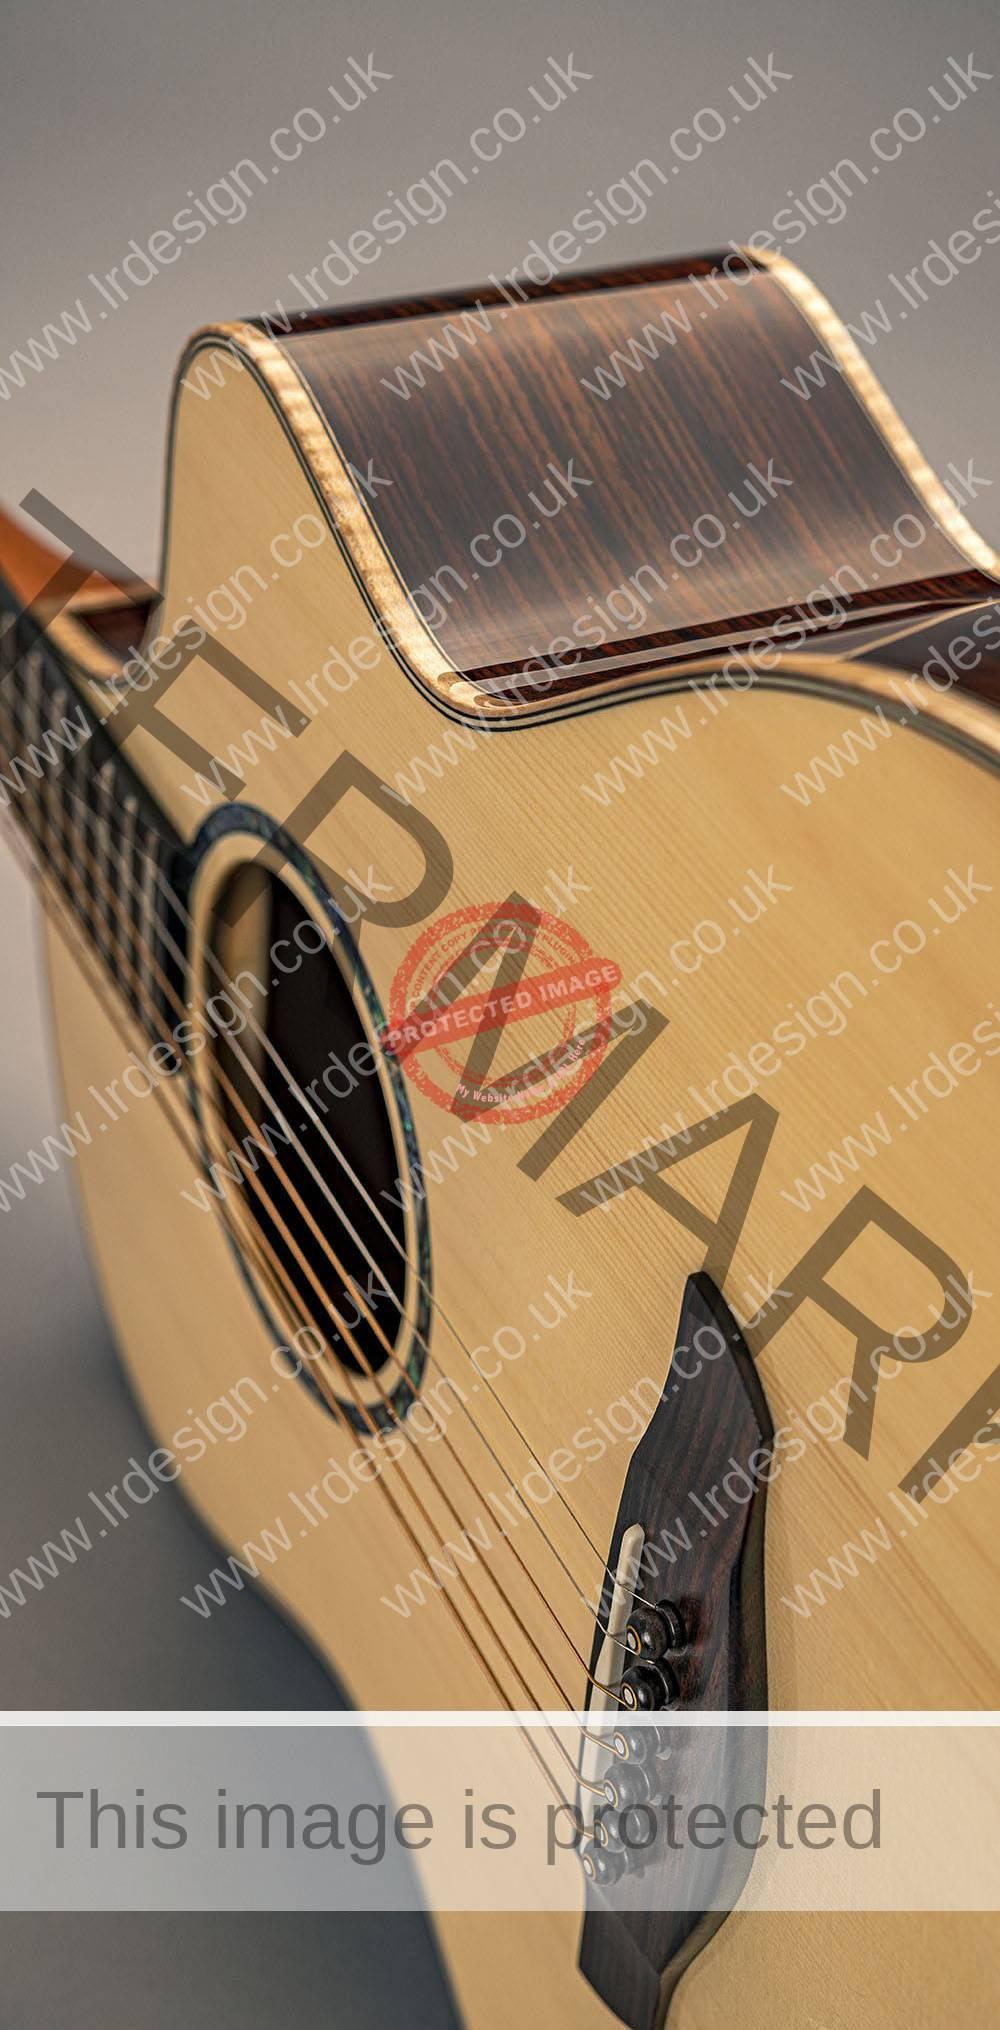 Faith acoustic guitar side view.